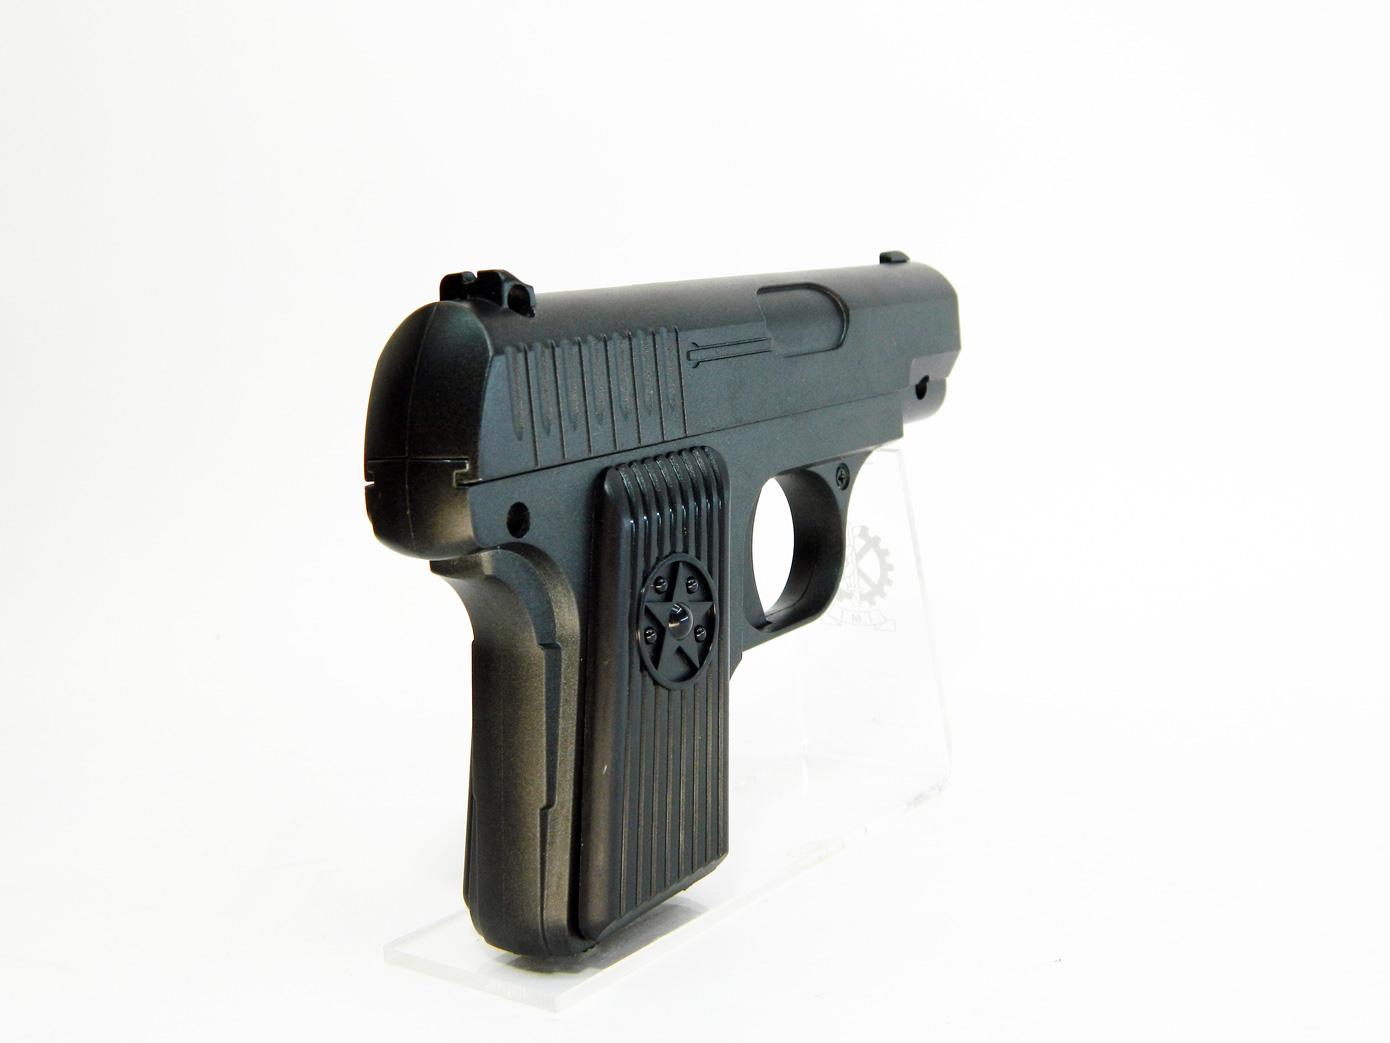 Пистолет ТТ мини изображение 1